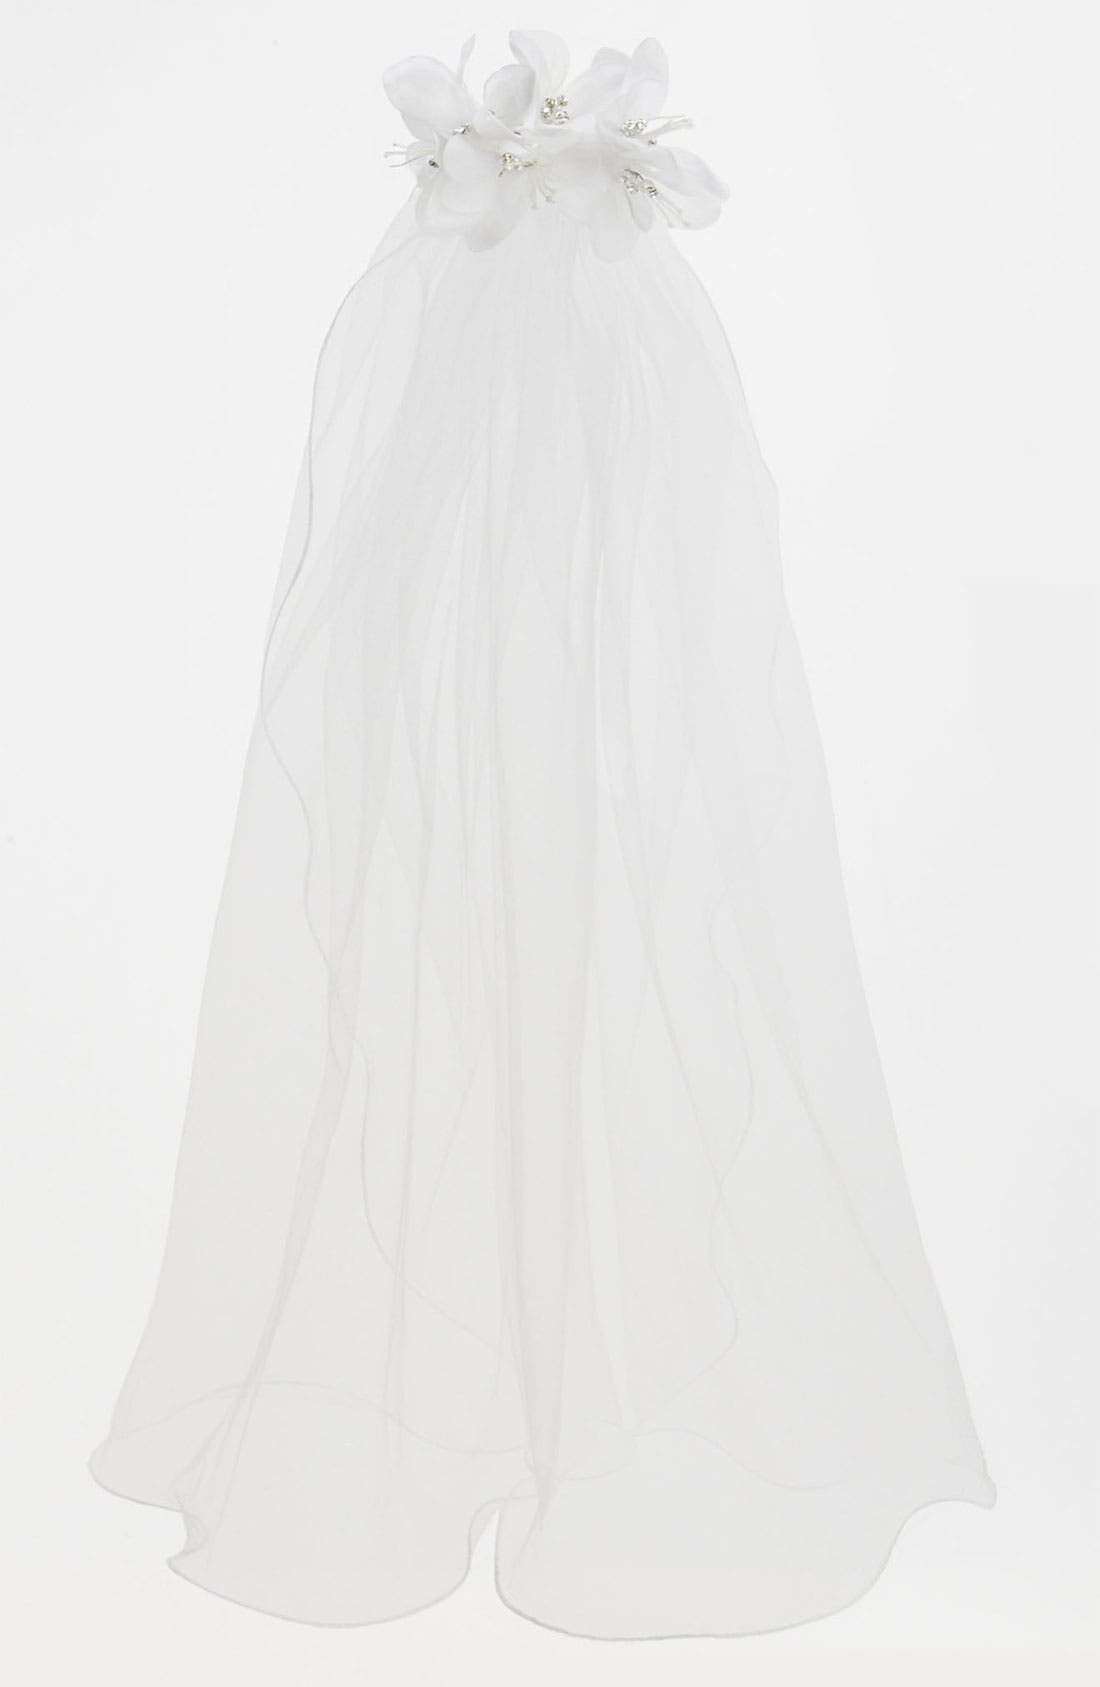 Main Image - Adrianna Cupelli 'Magnolia' Barrette Veil (Girls)